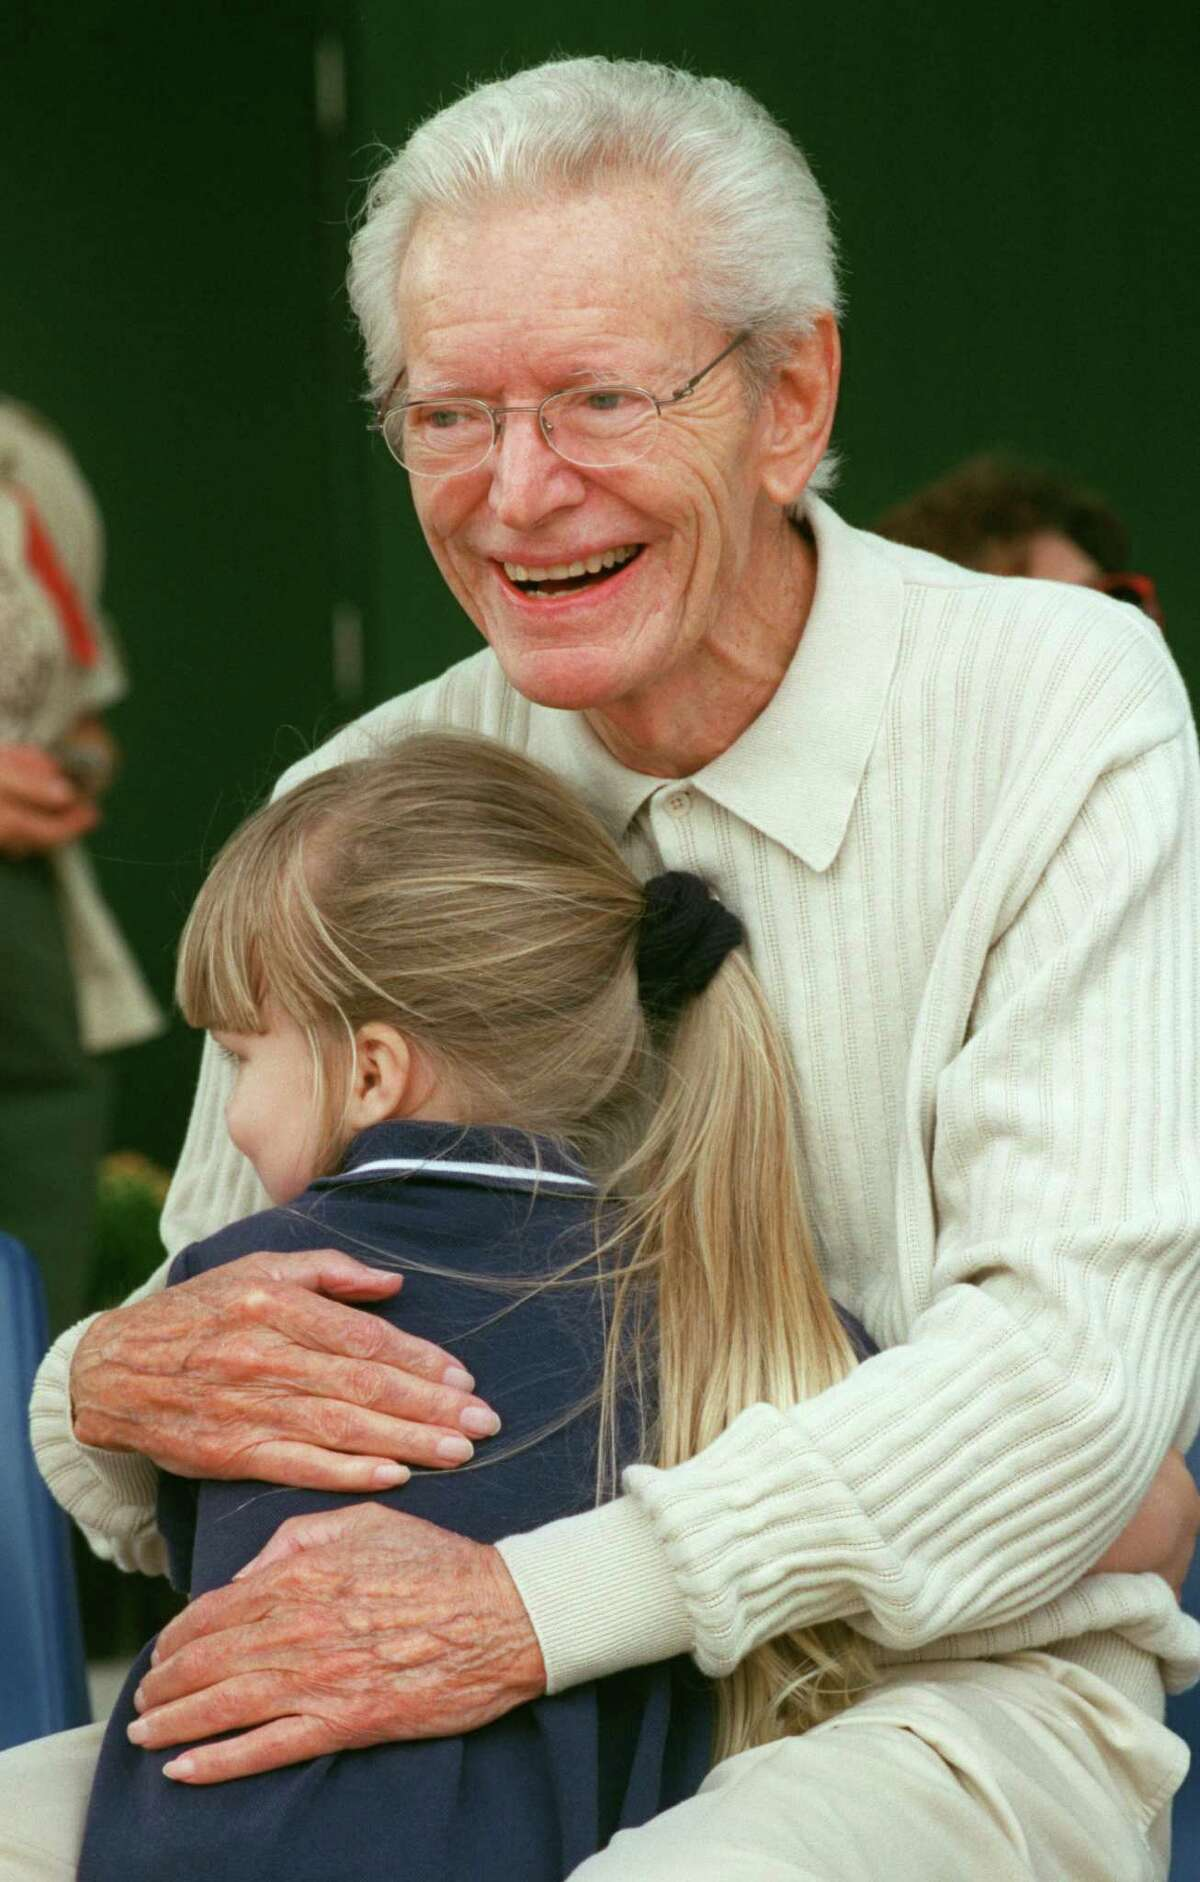 Caroline Culberson, 4, hugs Dr. John P. McGovern at the new John P. McGovern Children's Zoo.